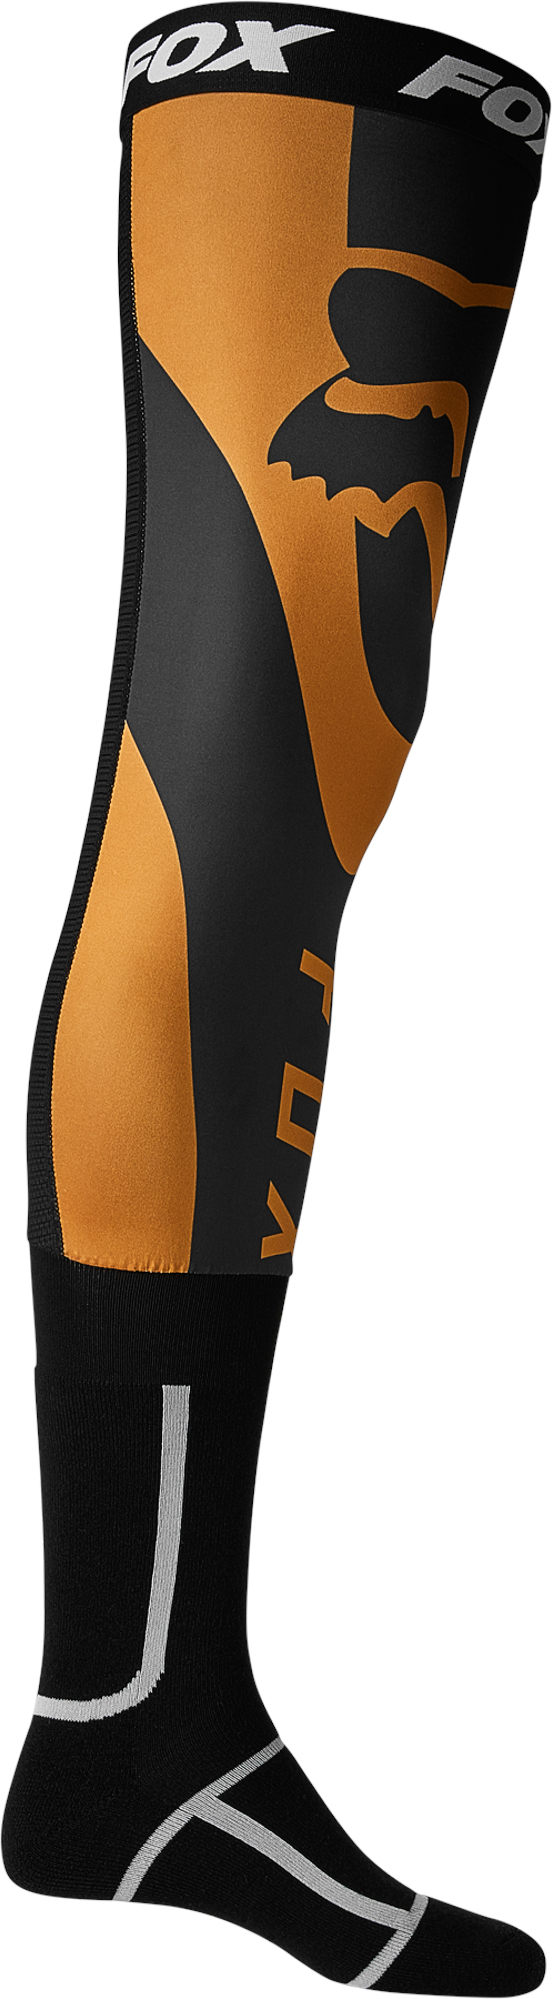 FOX Mirer Knee Brace Sock - BLACK/GOLD MX22